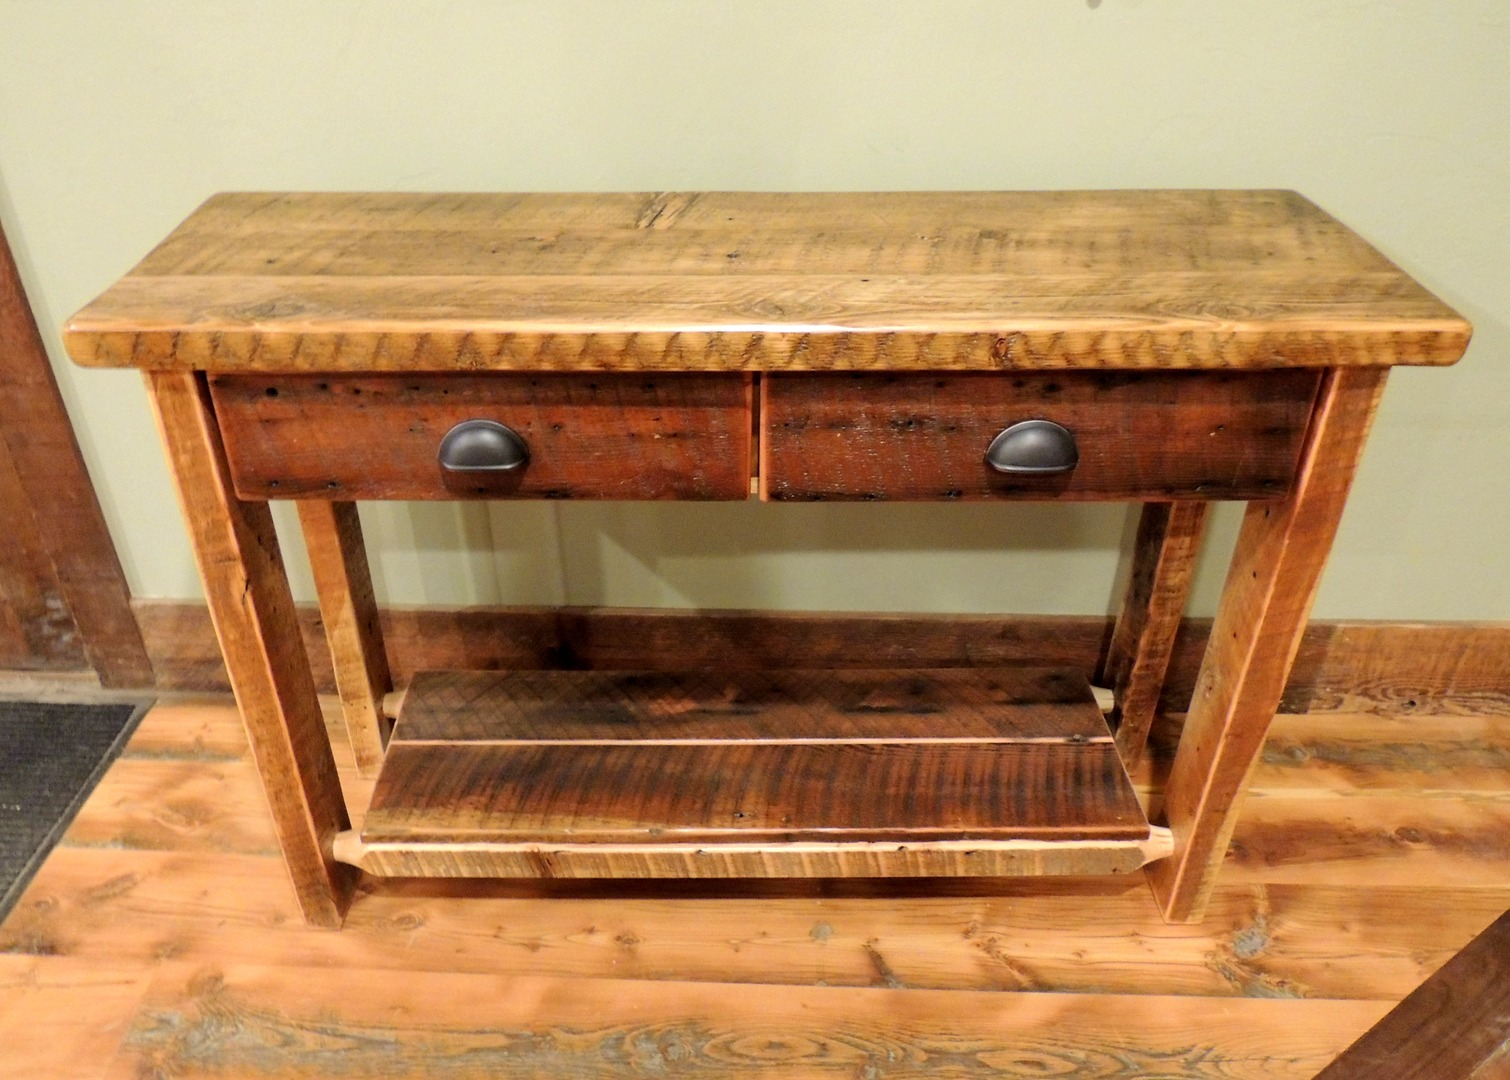 Barn wood furniture - Barn Wood Furniture